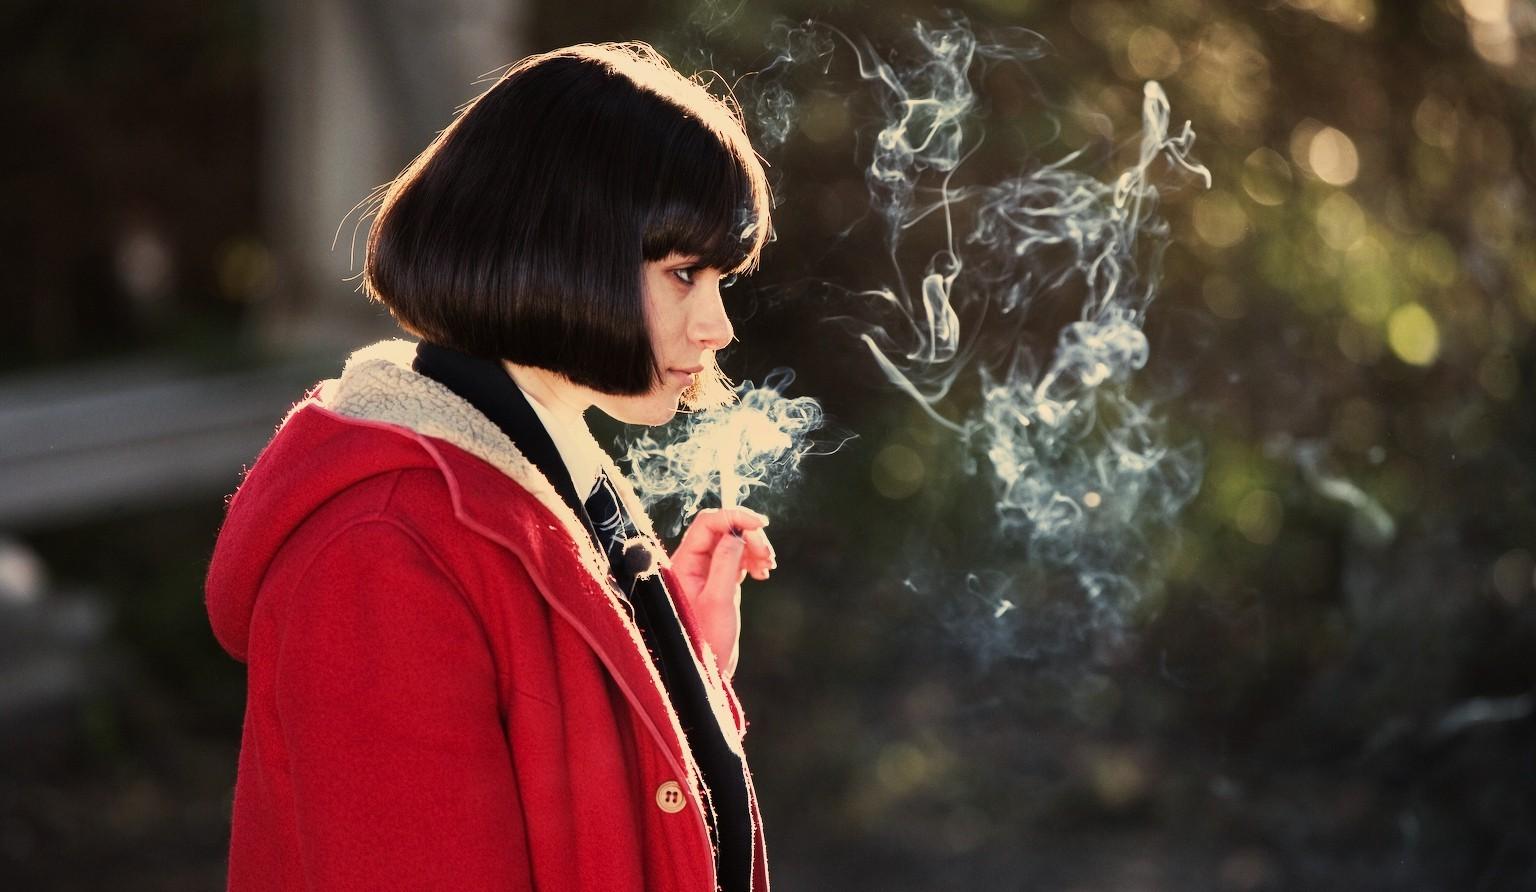 https://c.wallhere.com/photos/cb/99/1536x892_px_Cigars_Jordana_Bevan_smoking_Submarine_movie_women_Yasmin_Paige-1011667.jpg!d